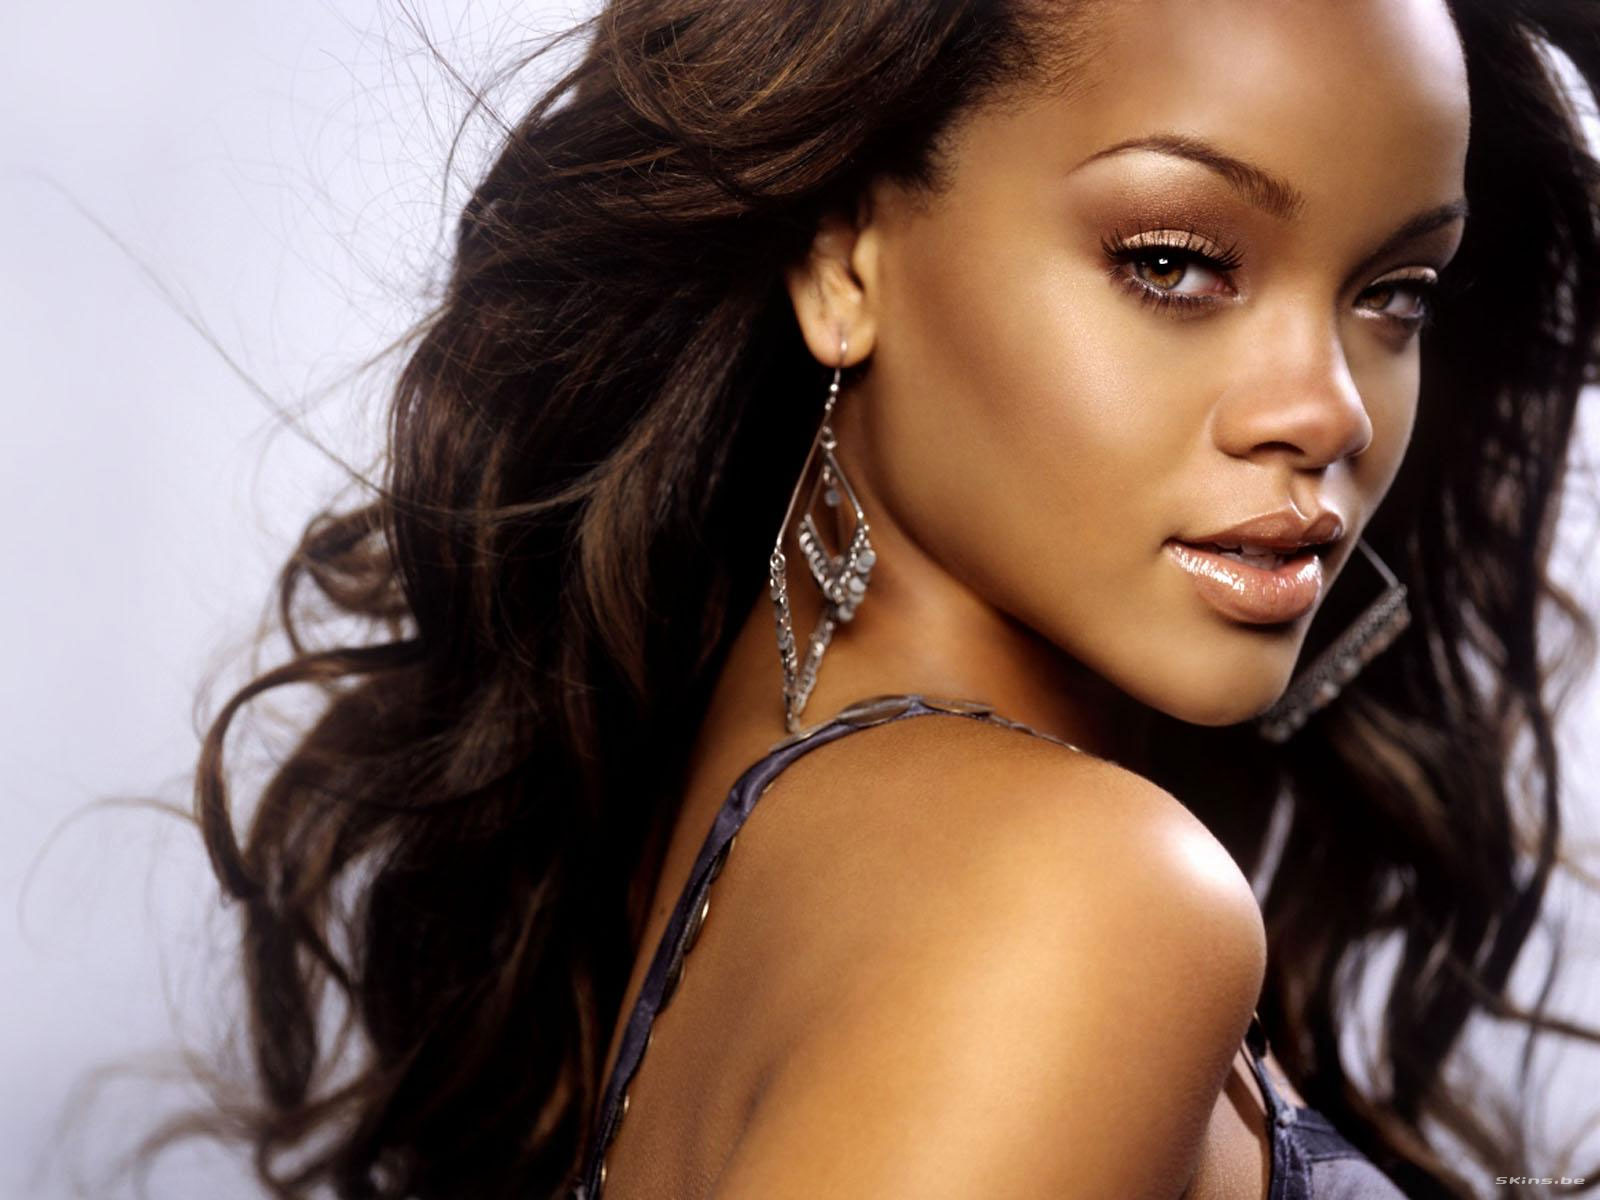 Rihanna Bikini Wallpapers Picture 3